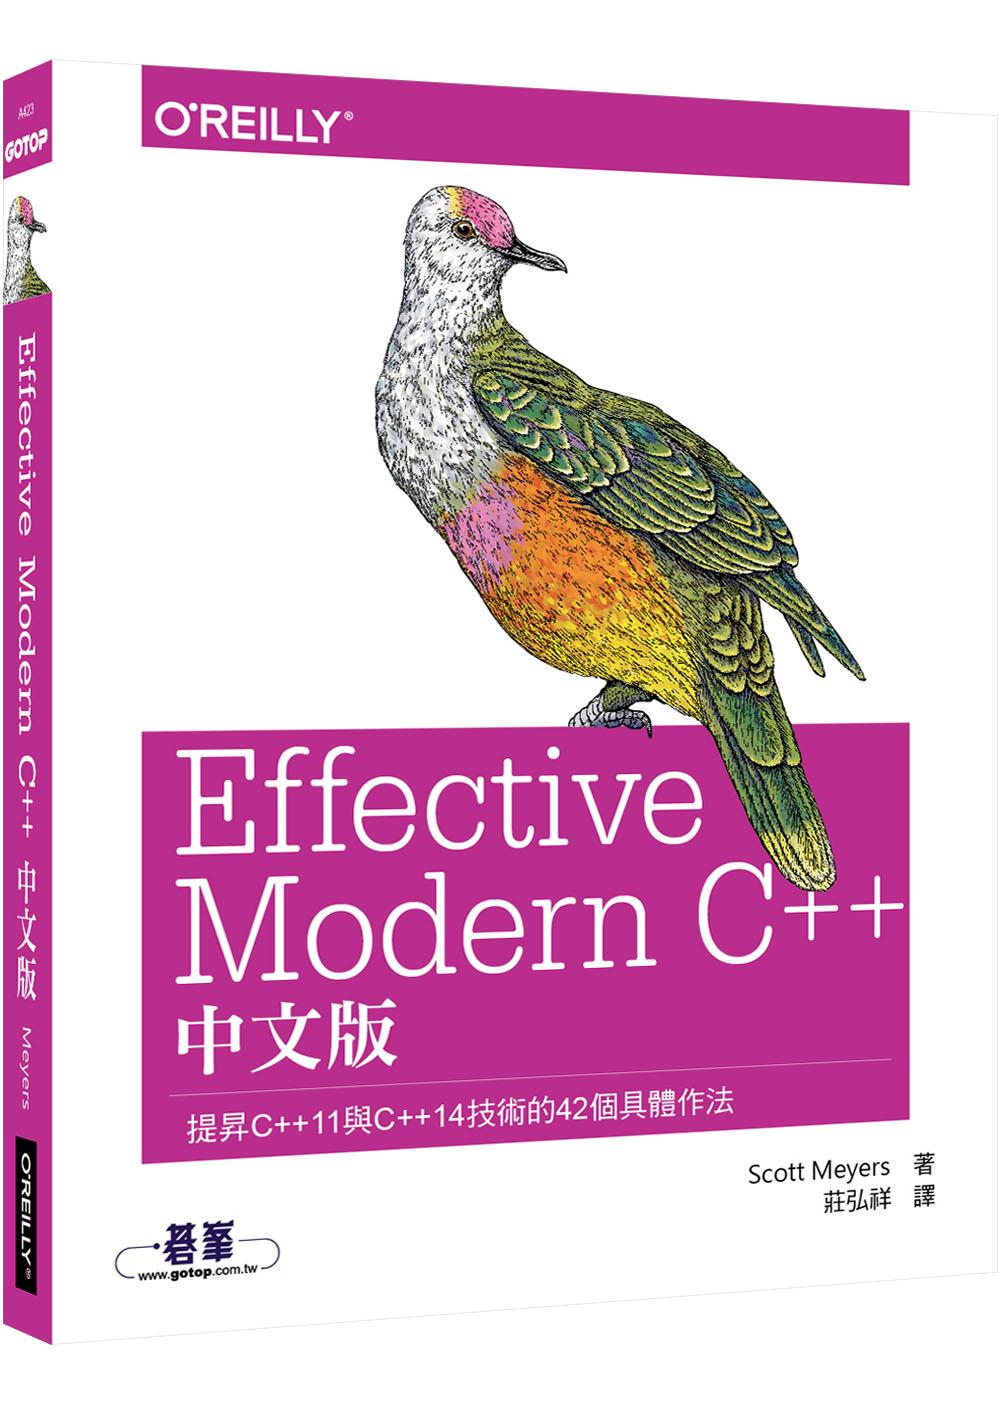 the c++ programming language 國際 中文 版